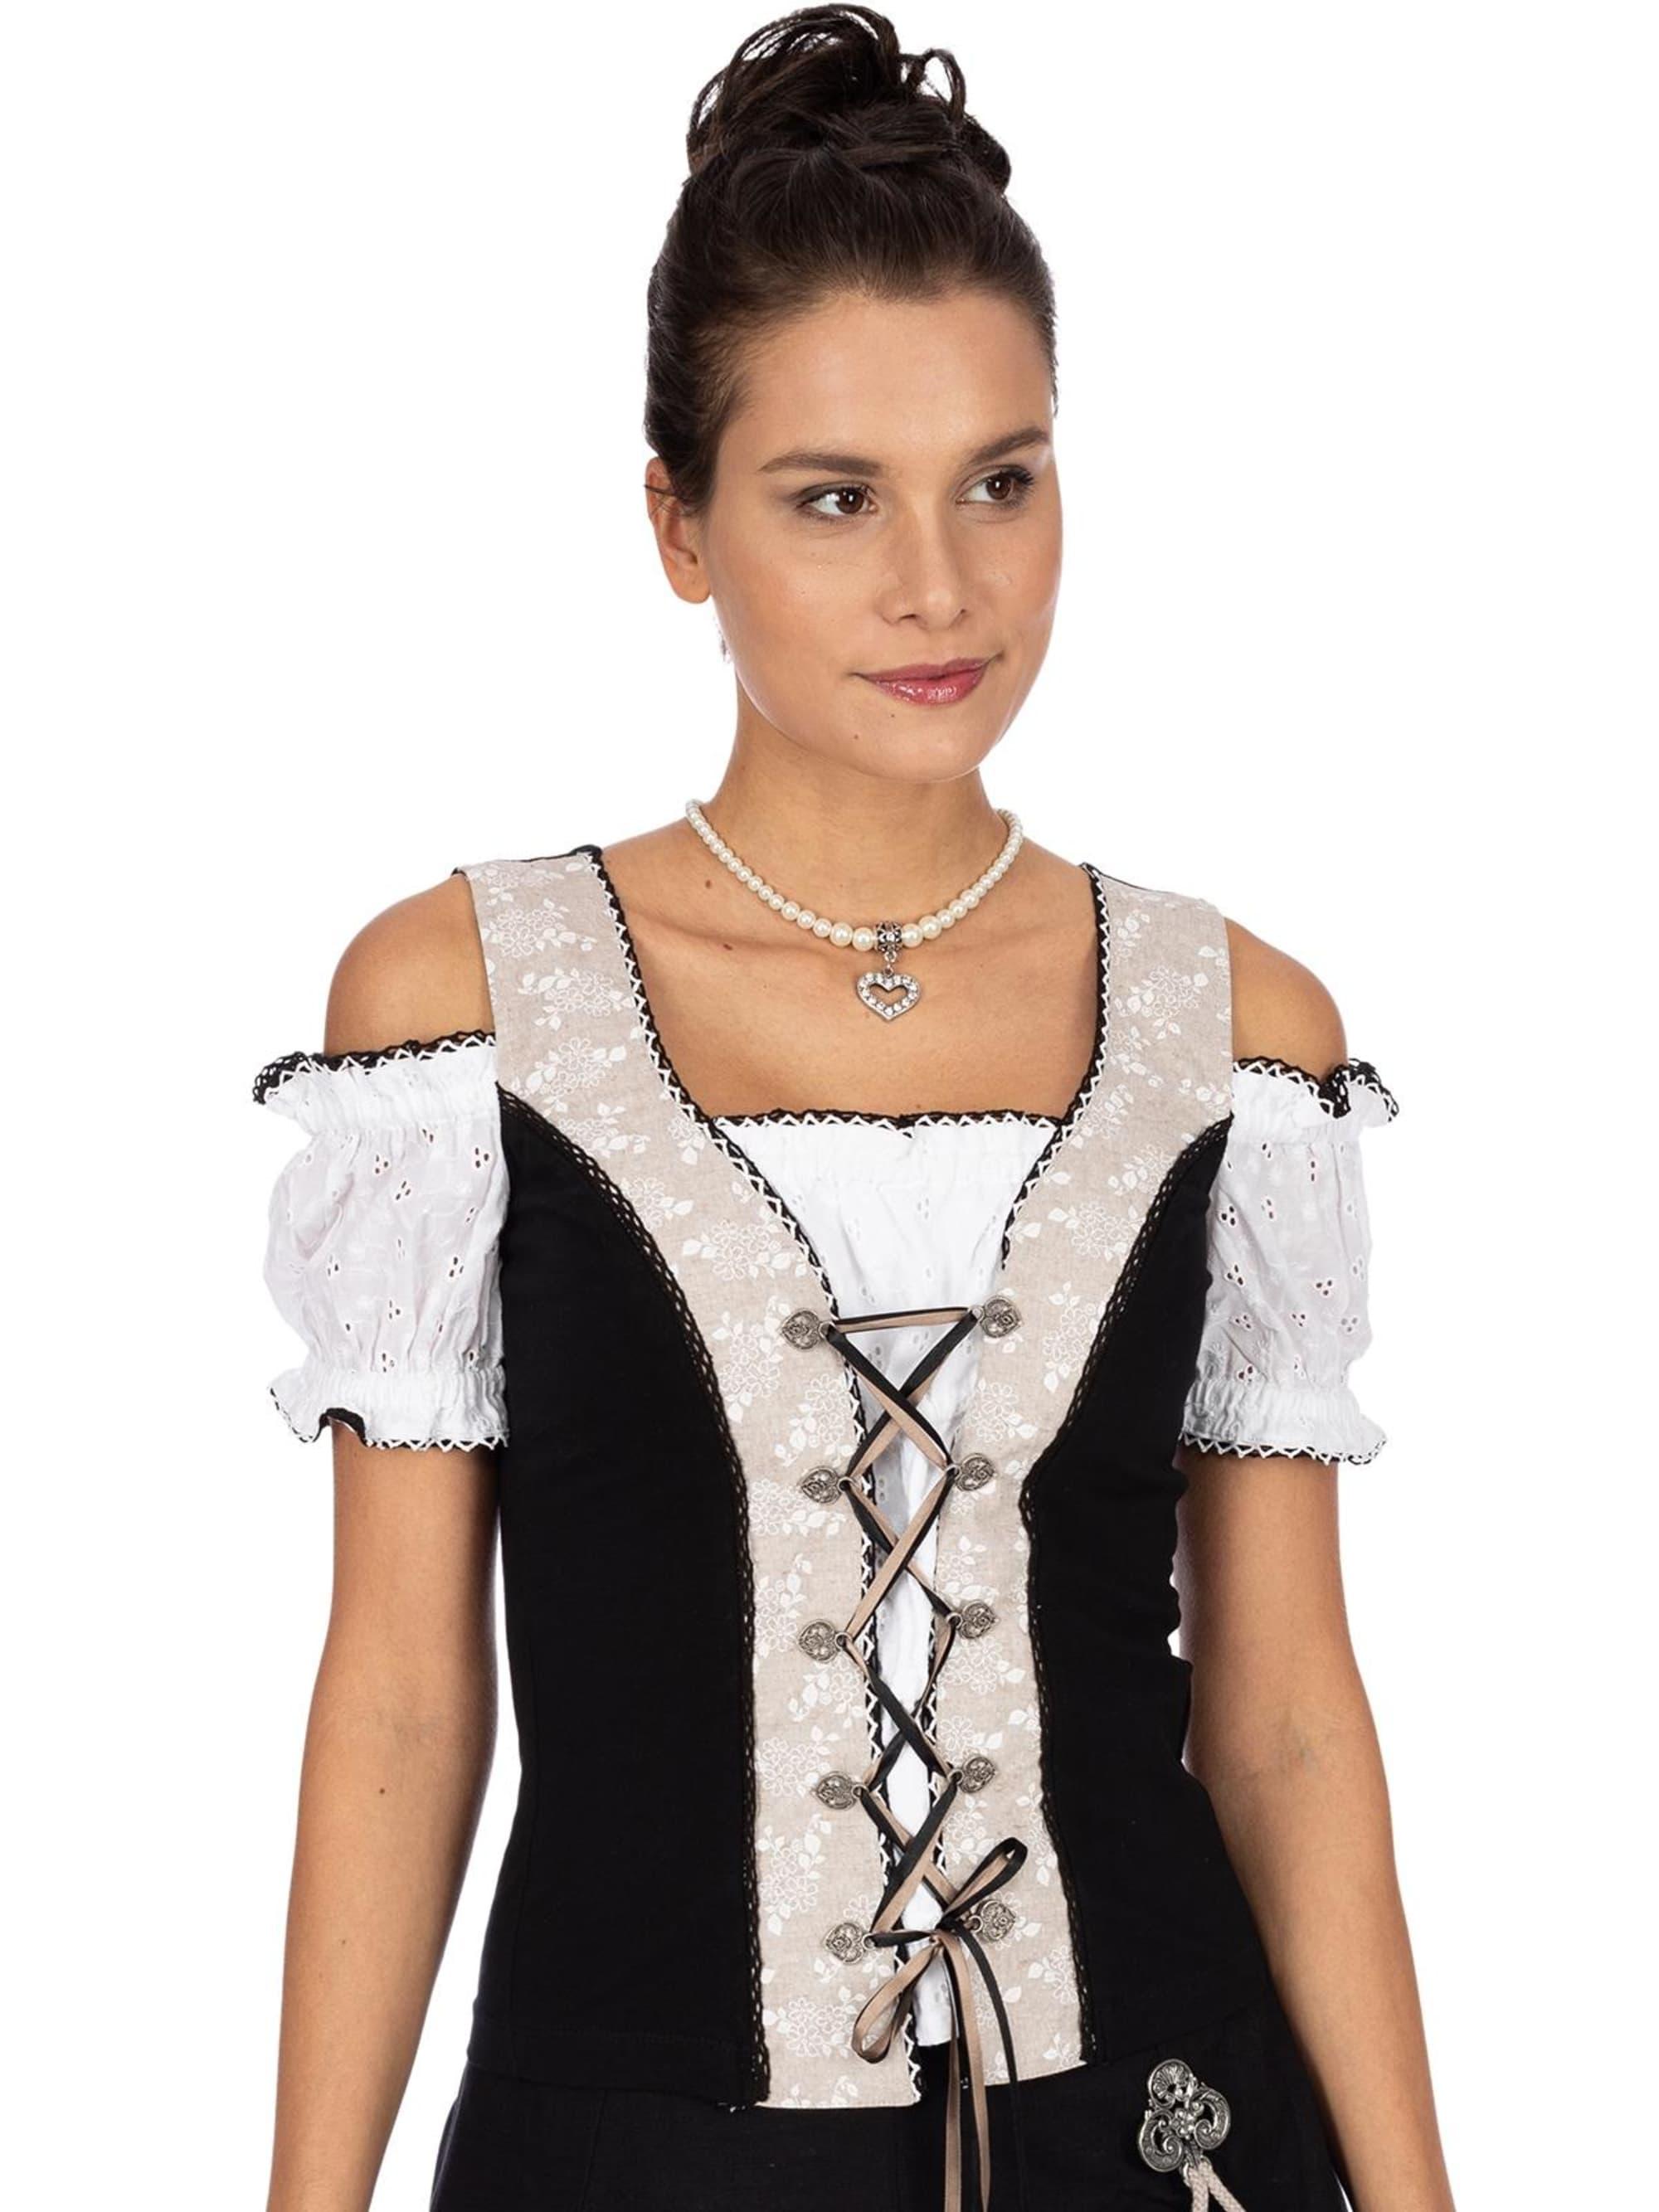 Marjo Landhaus Shirt ELISA2 beige schwarz XCeUj UVajk